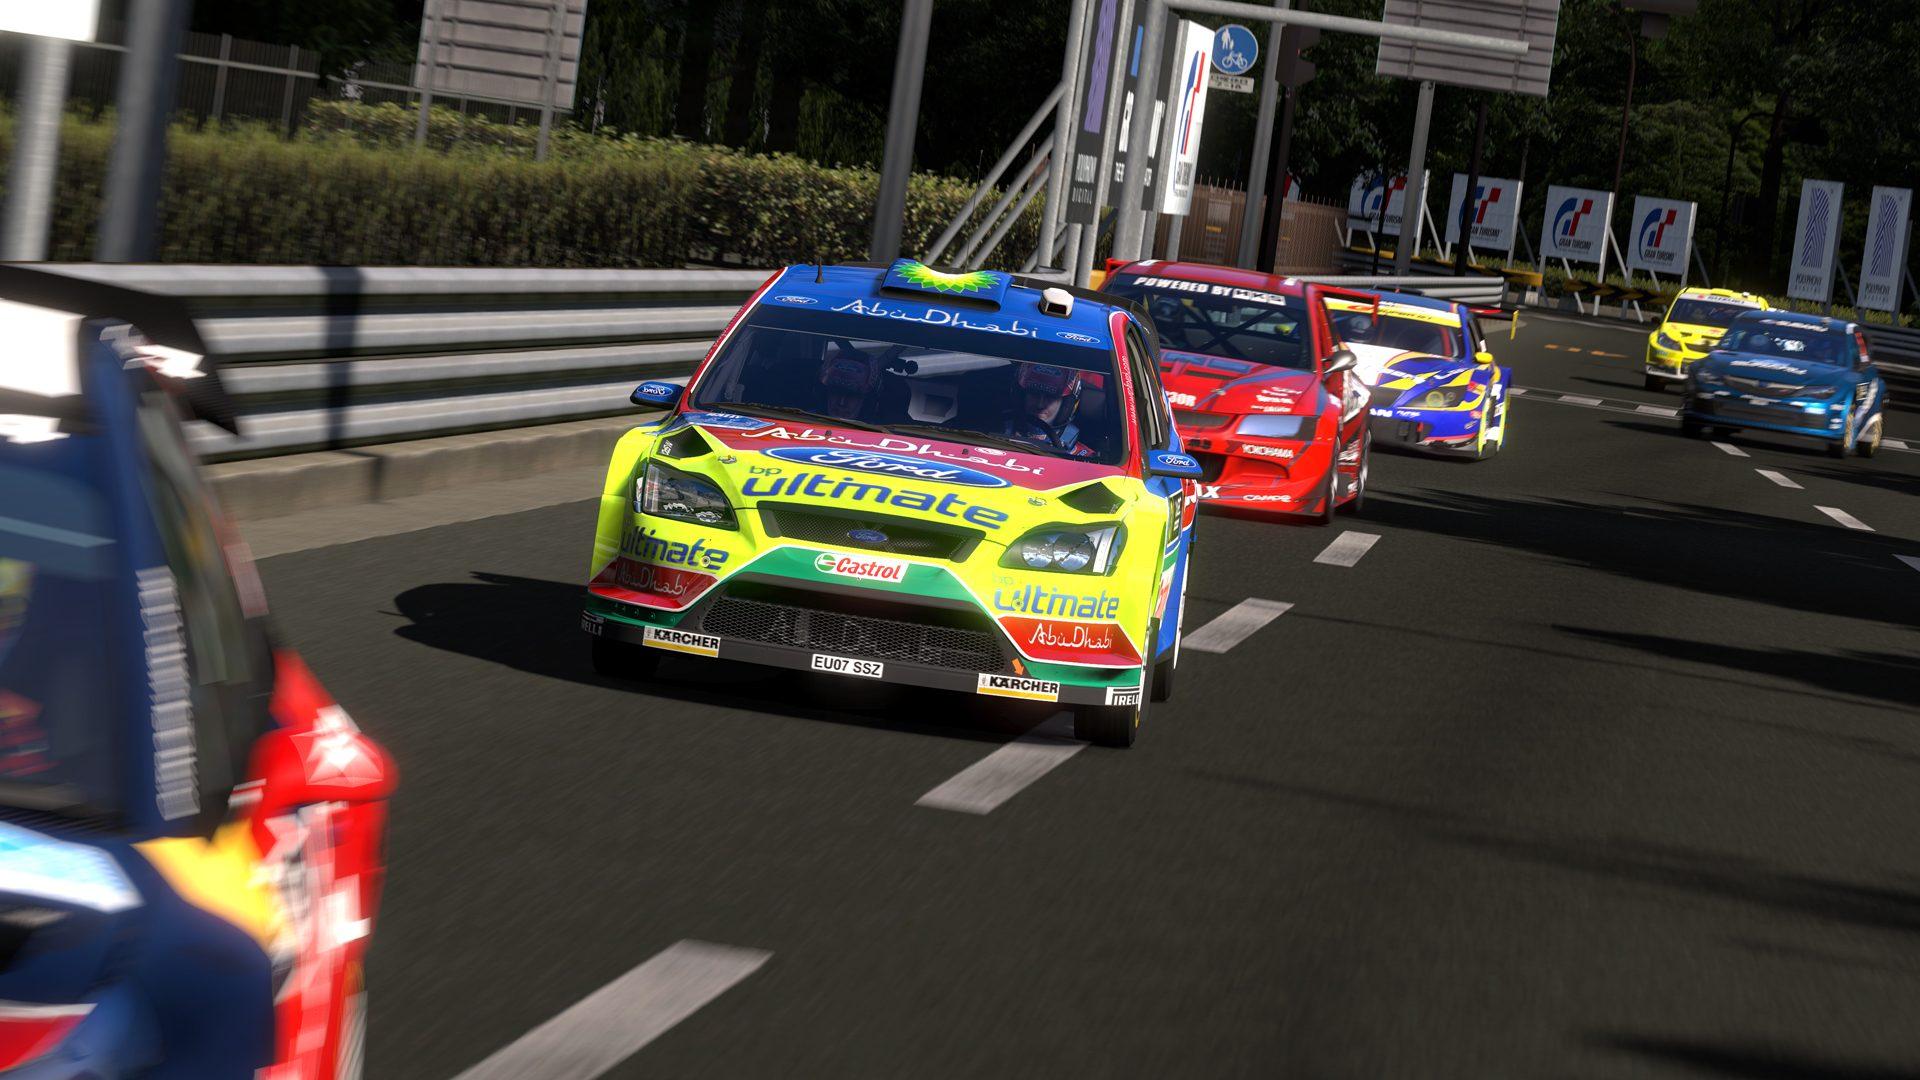 Forza Horizon 3 Car List >> Gran Turismo 5 Screenshots Feature WRC/Race Cars